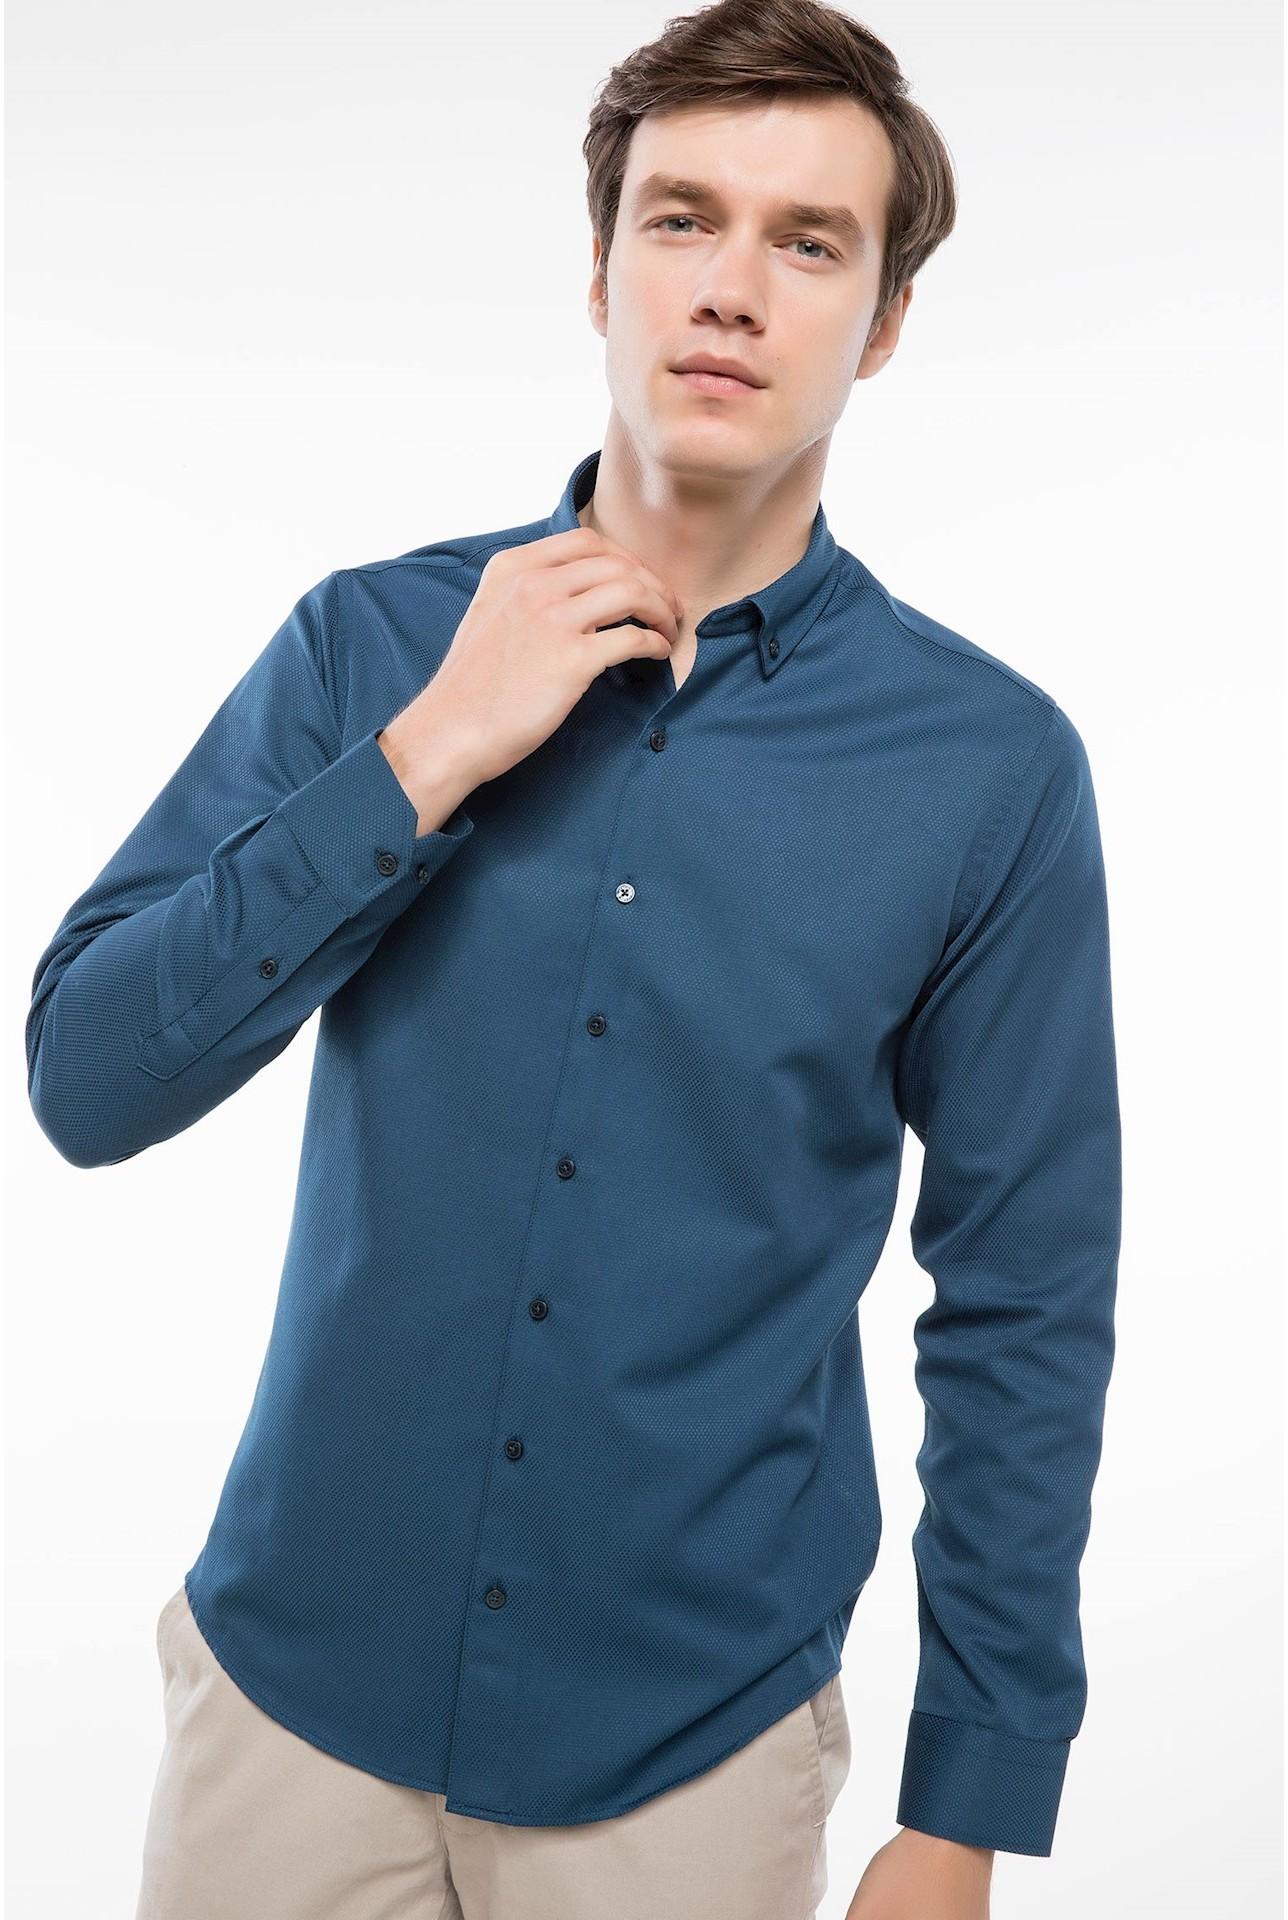 بالصور قميص رجالي , اسرار اناقة الرجال 594 6